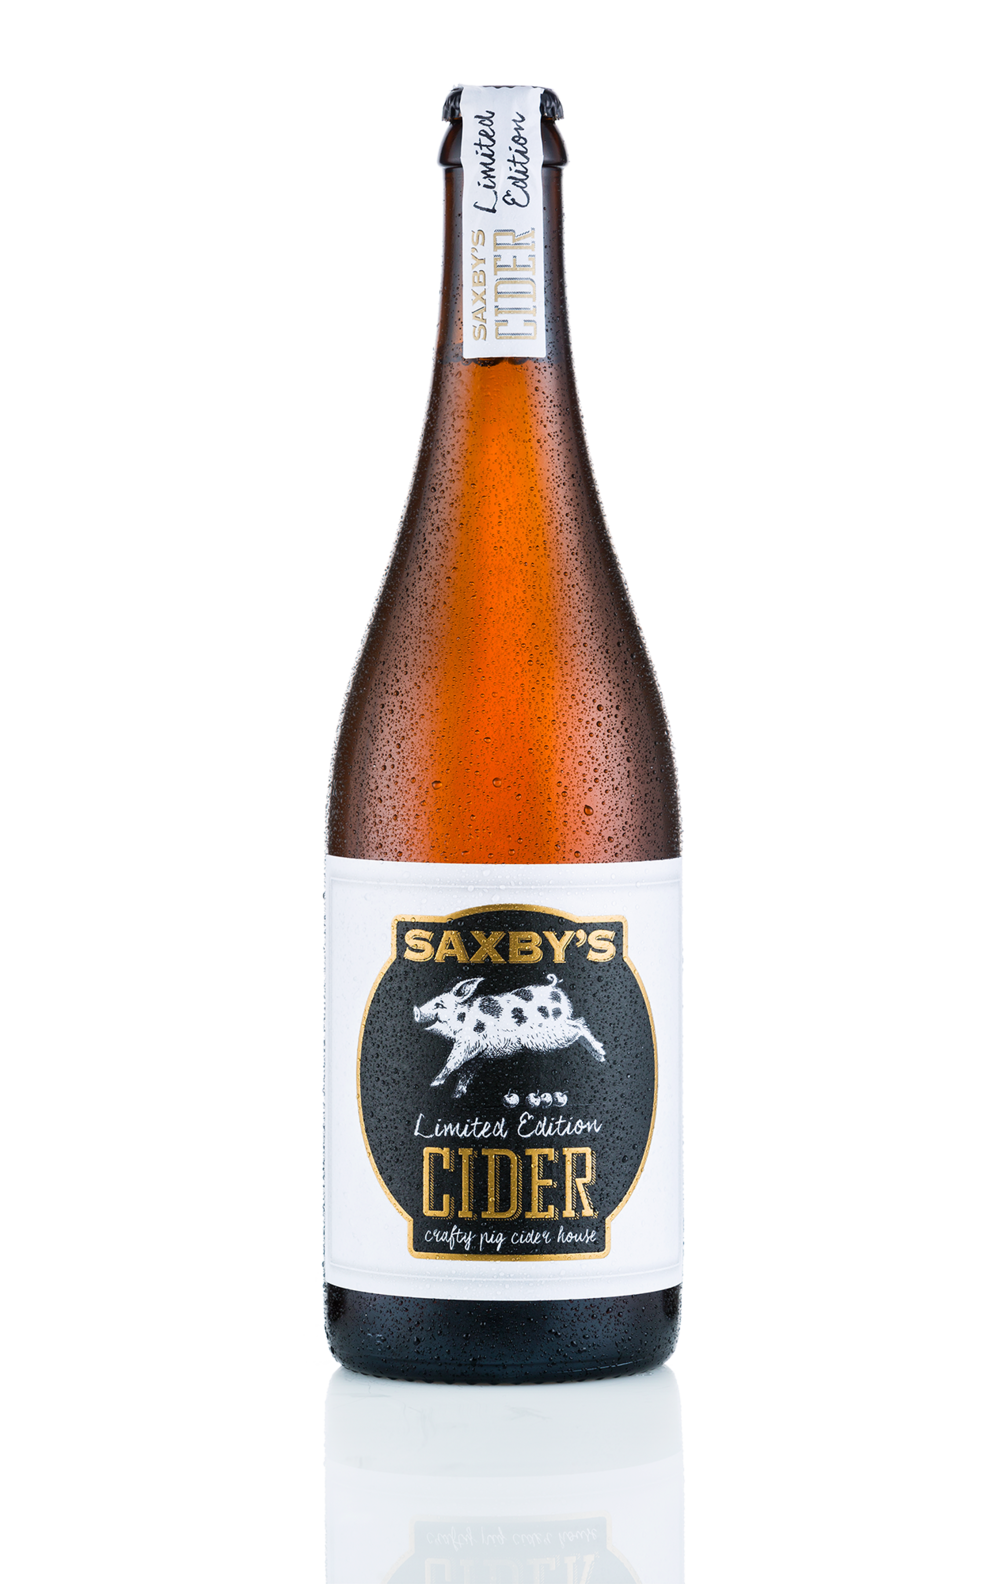 saxbys-cider-limited-edition-bottle-1263.png